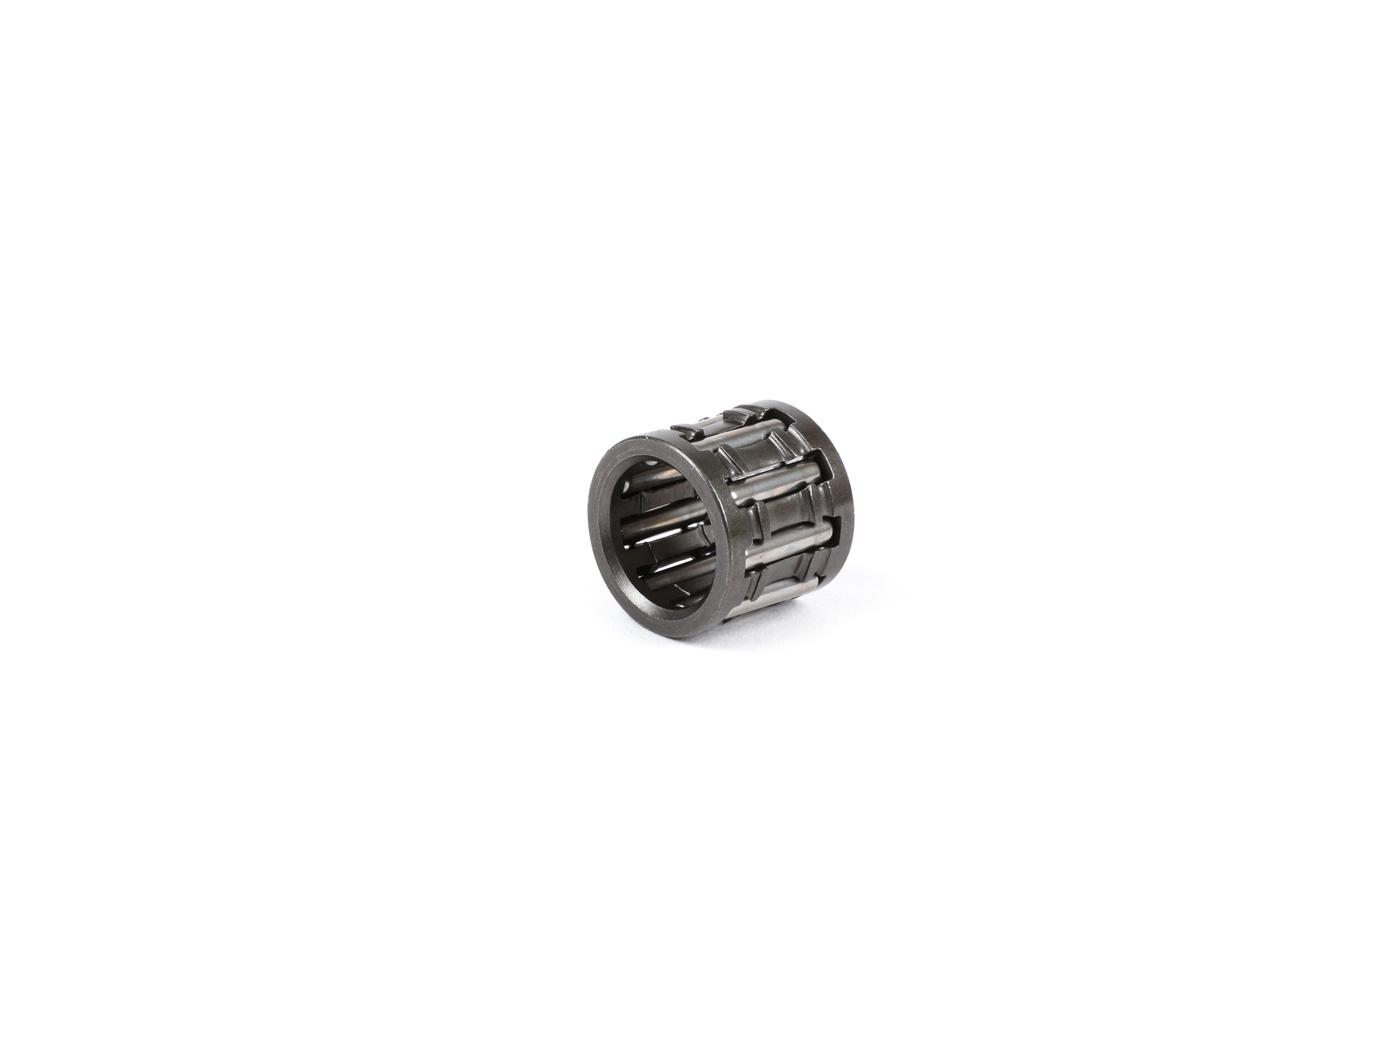 Kolbenbolzenlager 12x17x13mm Piaggio//Vespa NRG mc3 DD 50 LC Power Nadellager